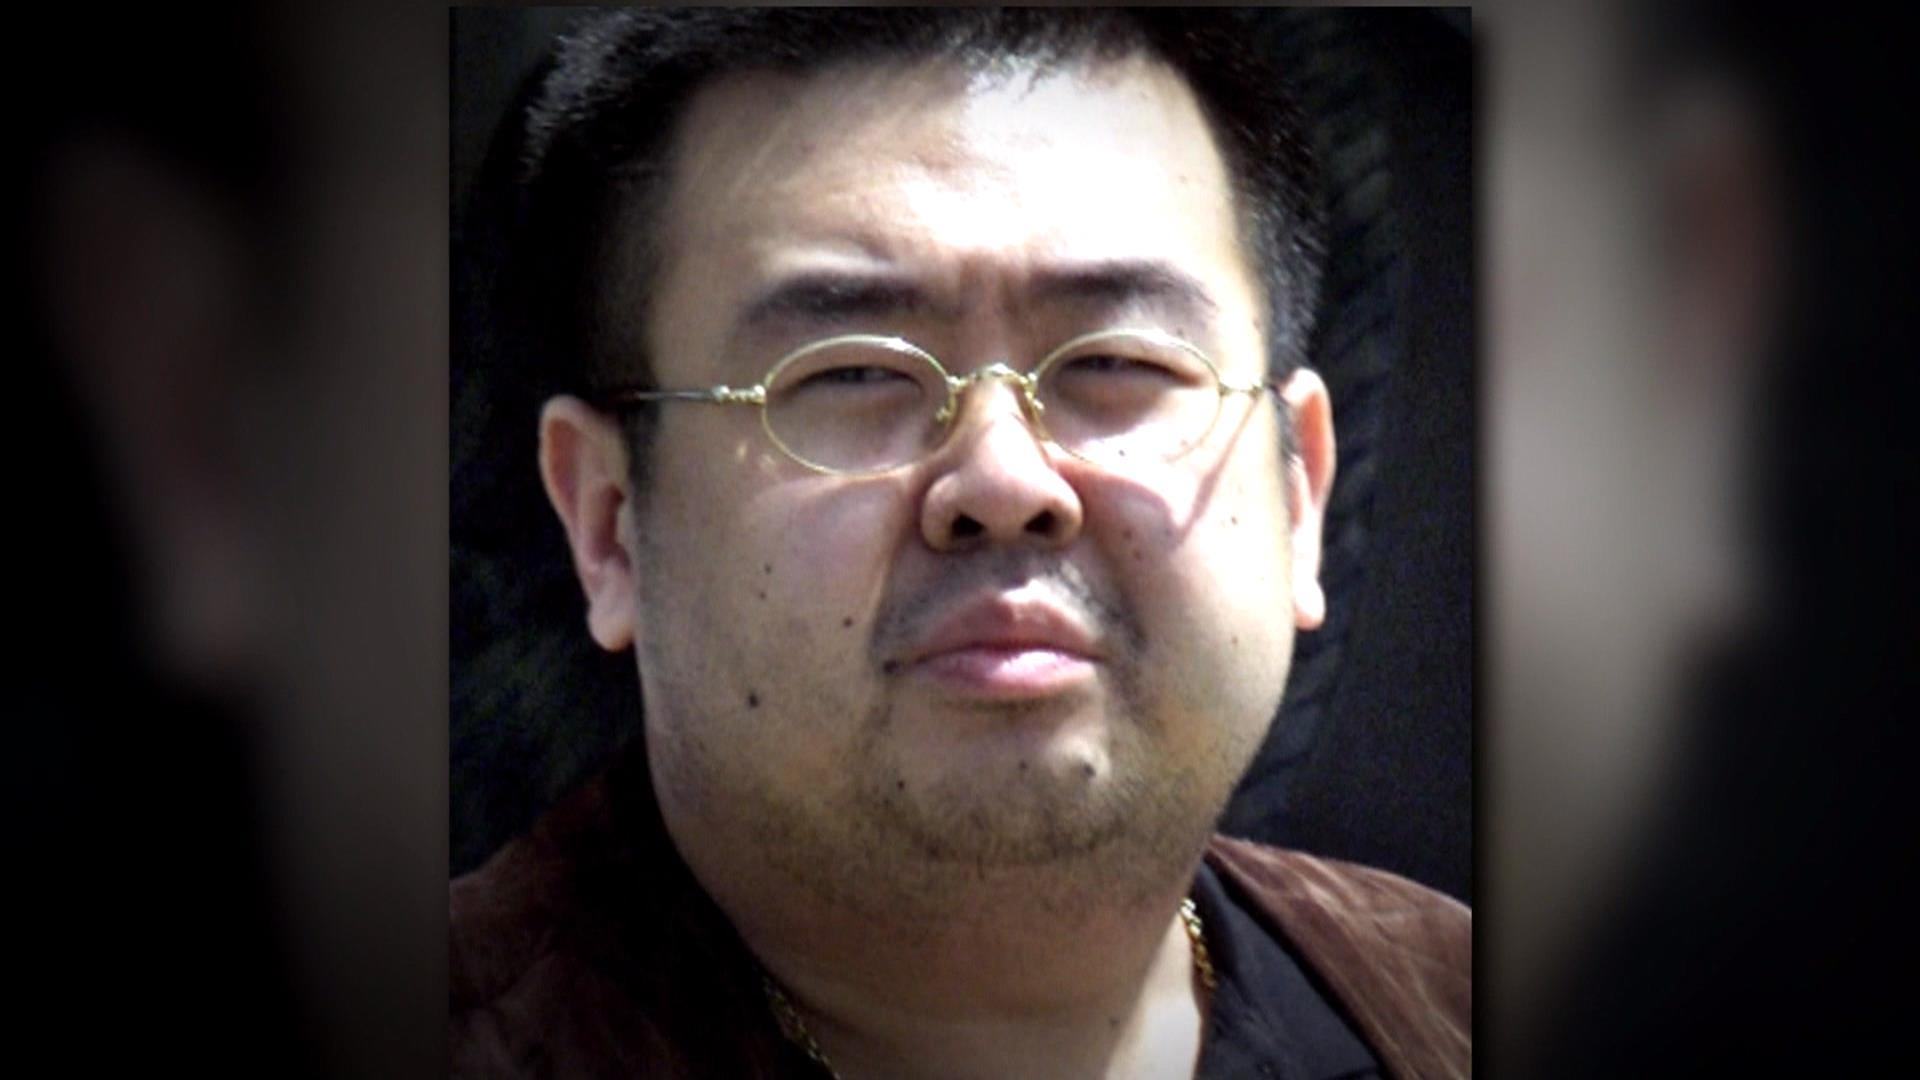 In Malaysia, stepbrother Kim Jong-un killed 14.02.2017 20